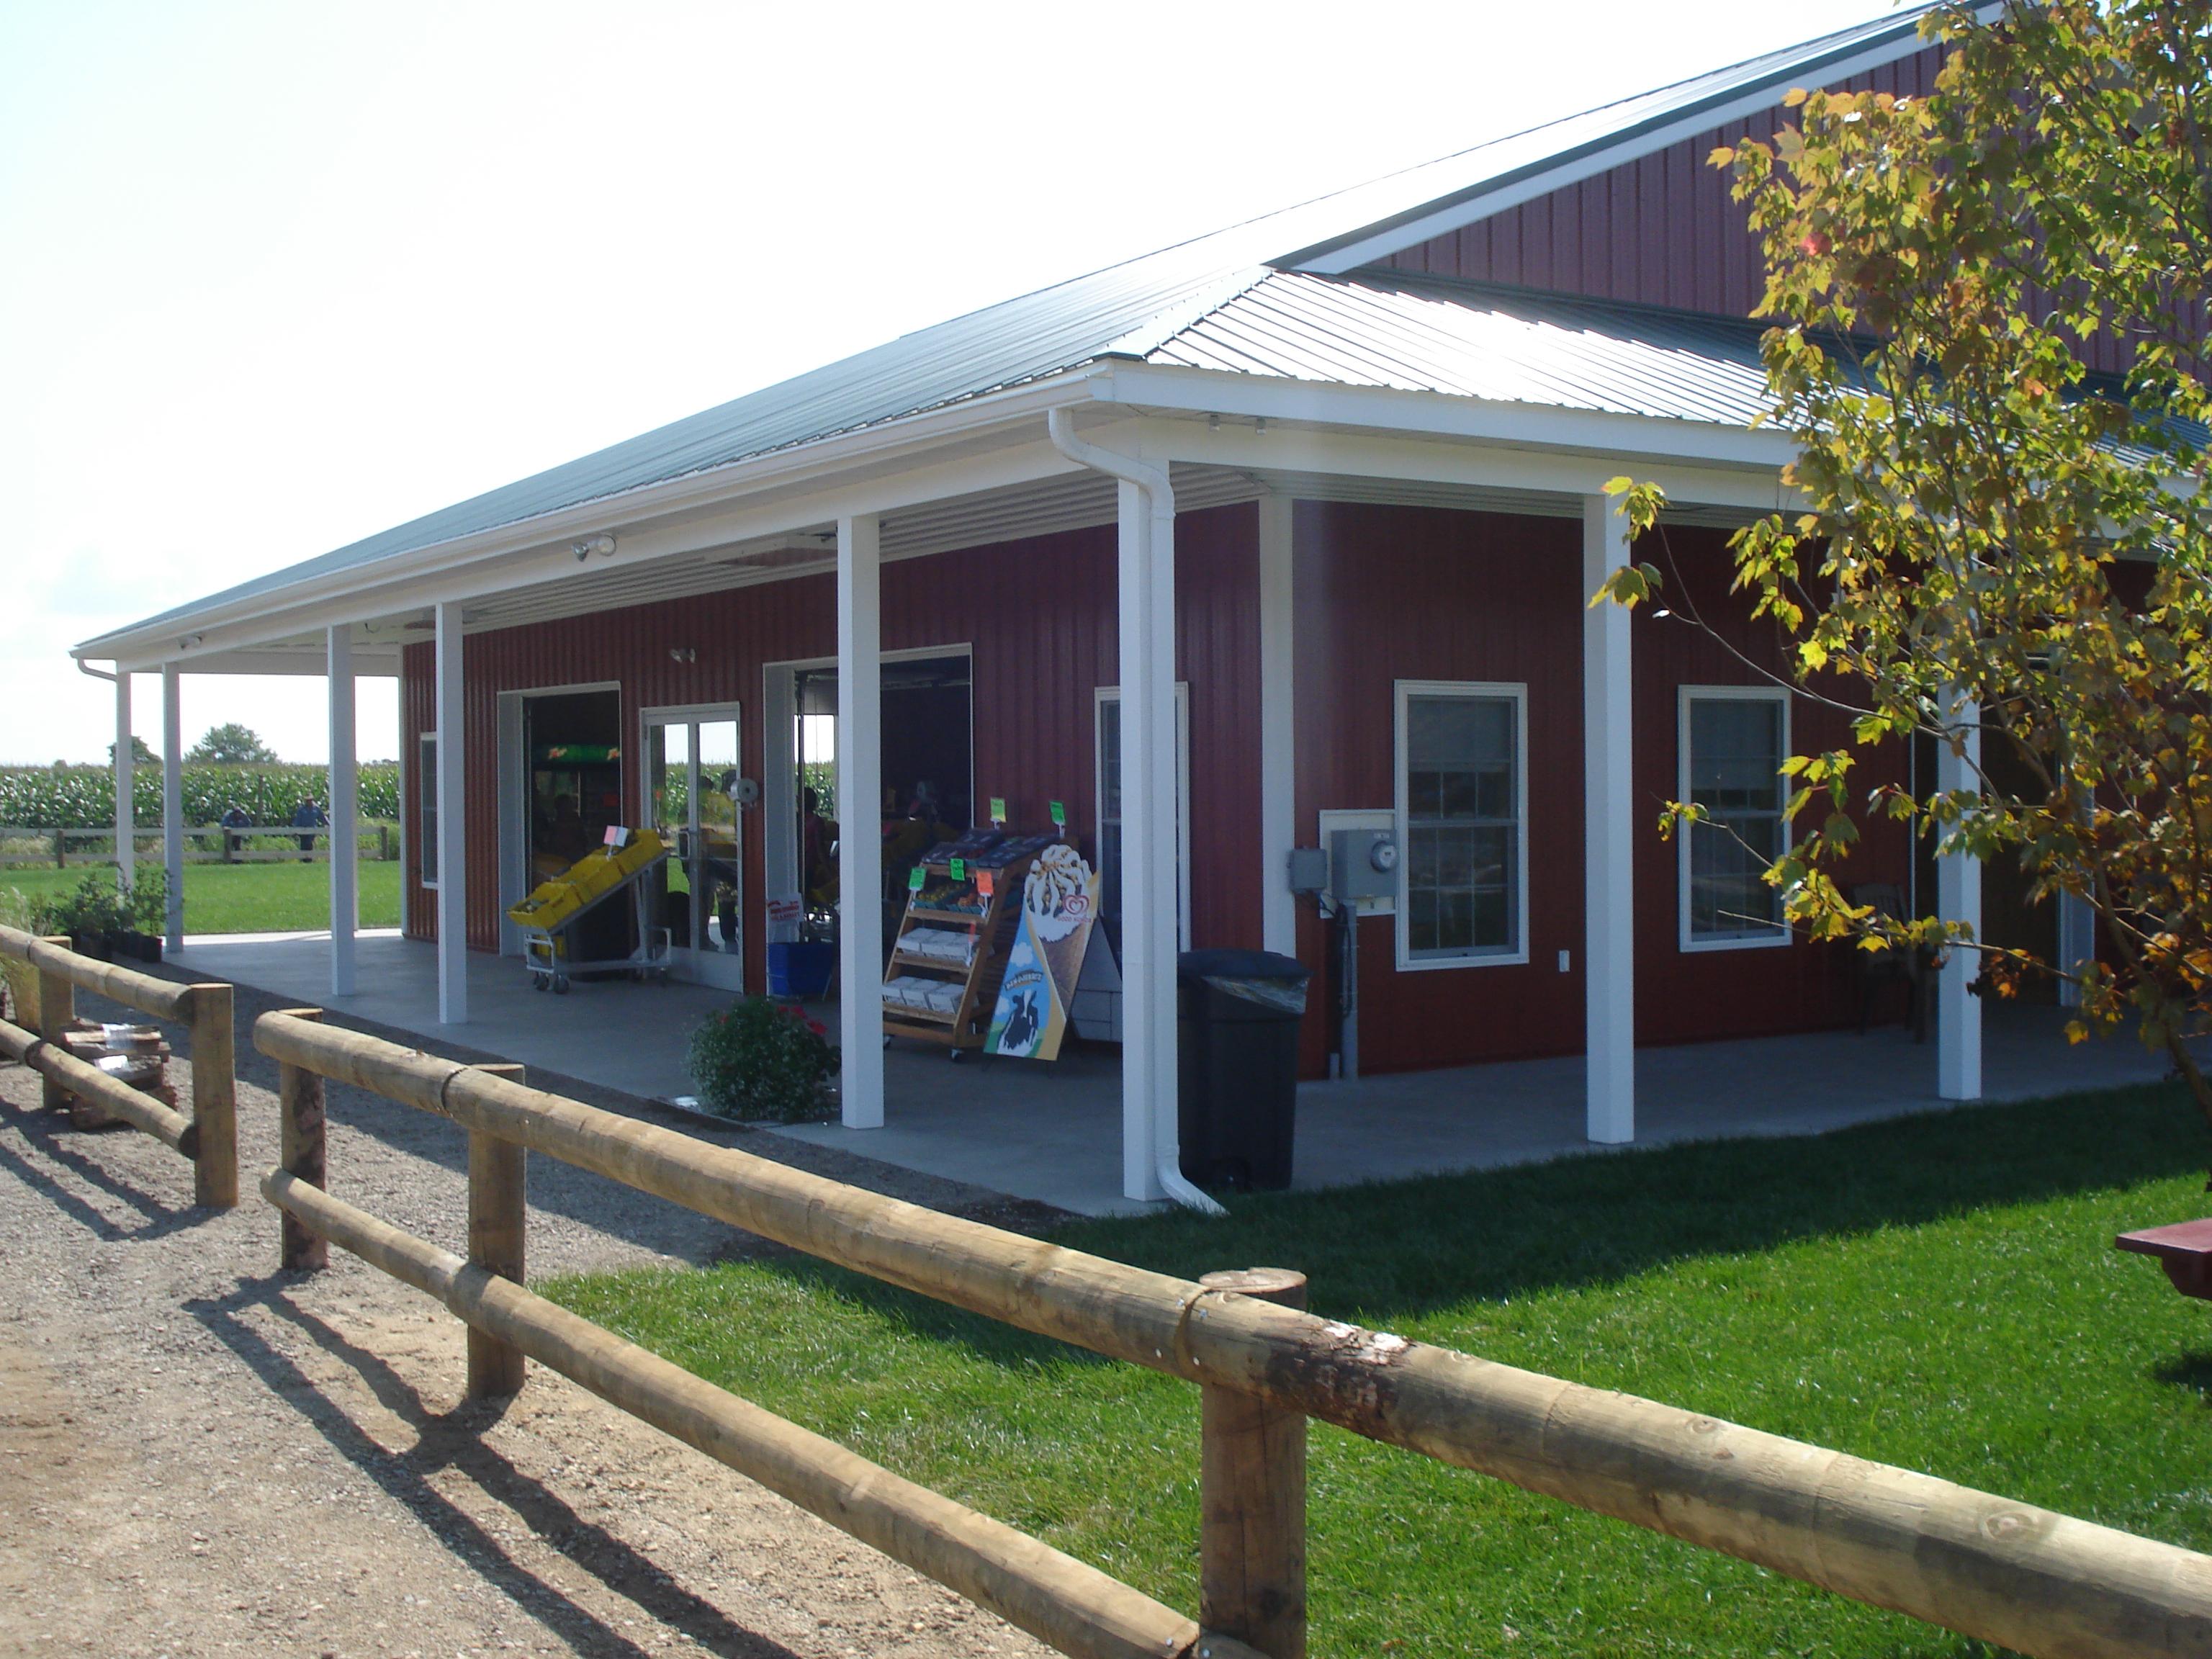 2010-08-06 007